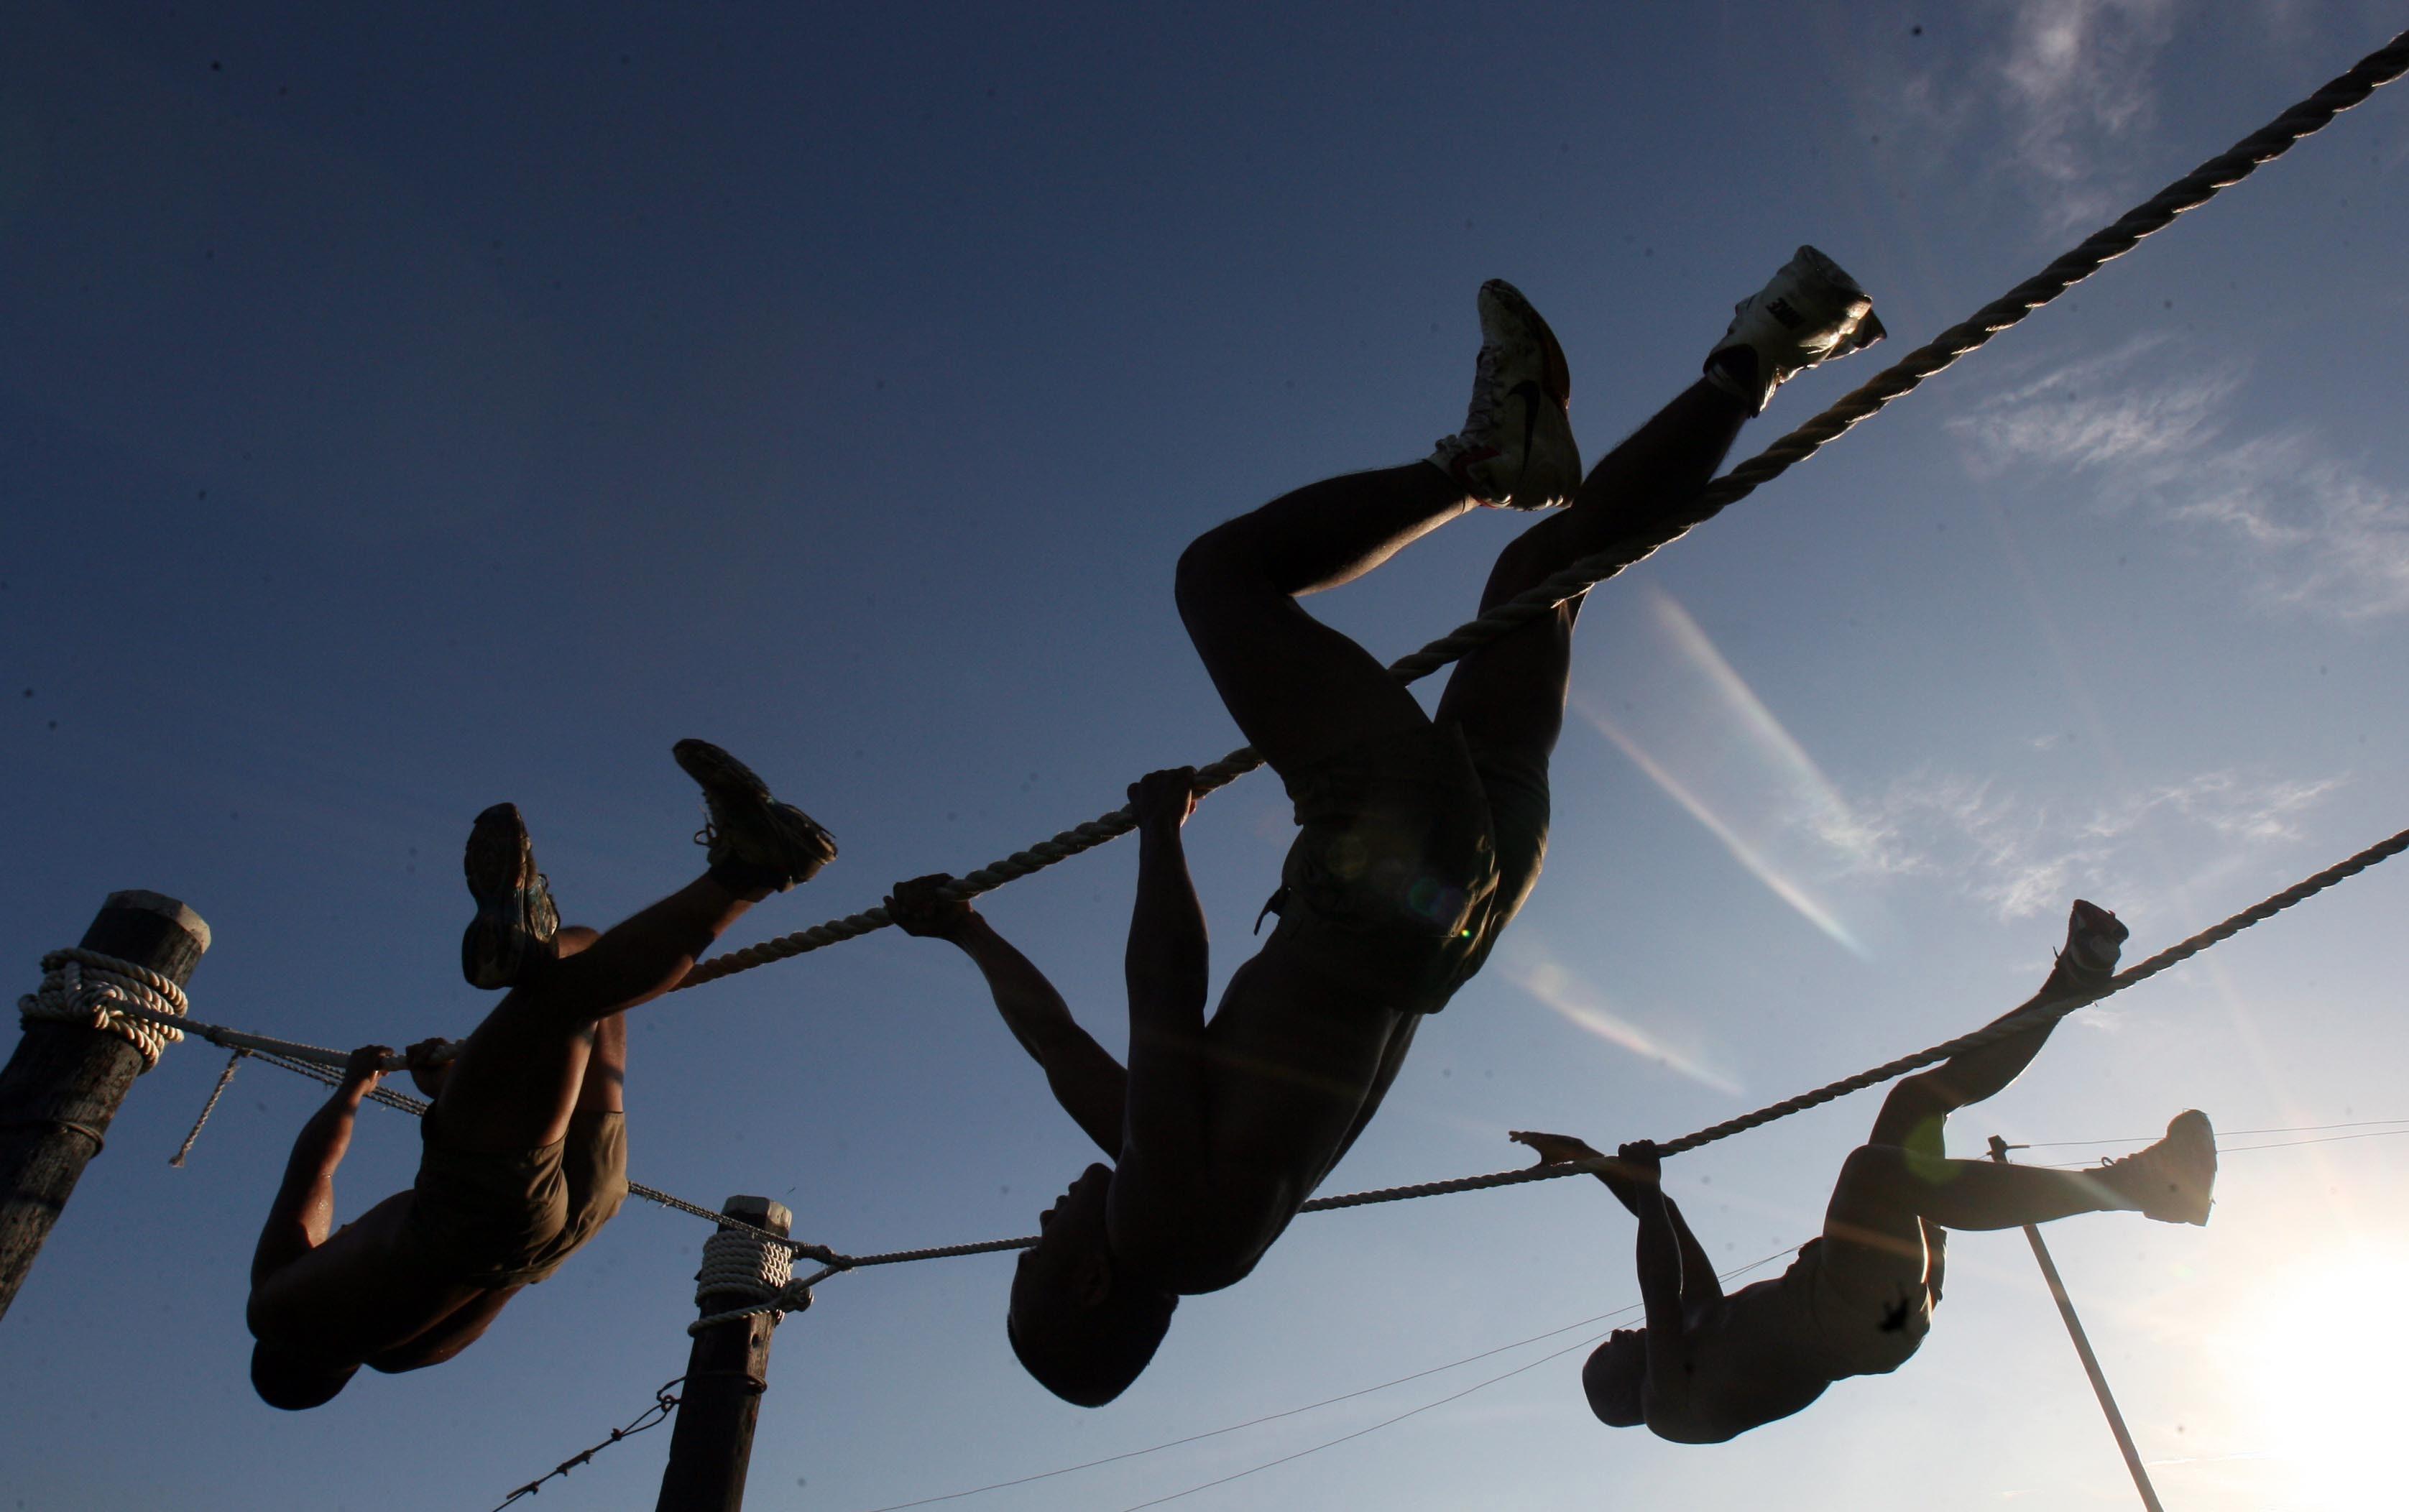 Three man climbing on rope under the sunset photo